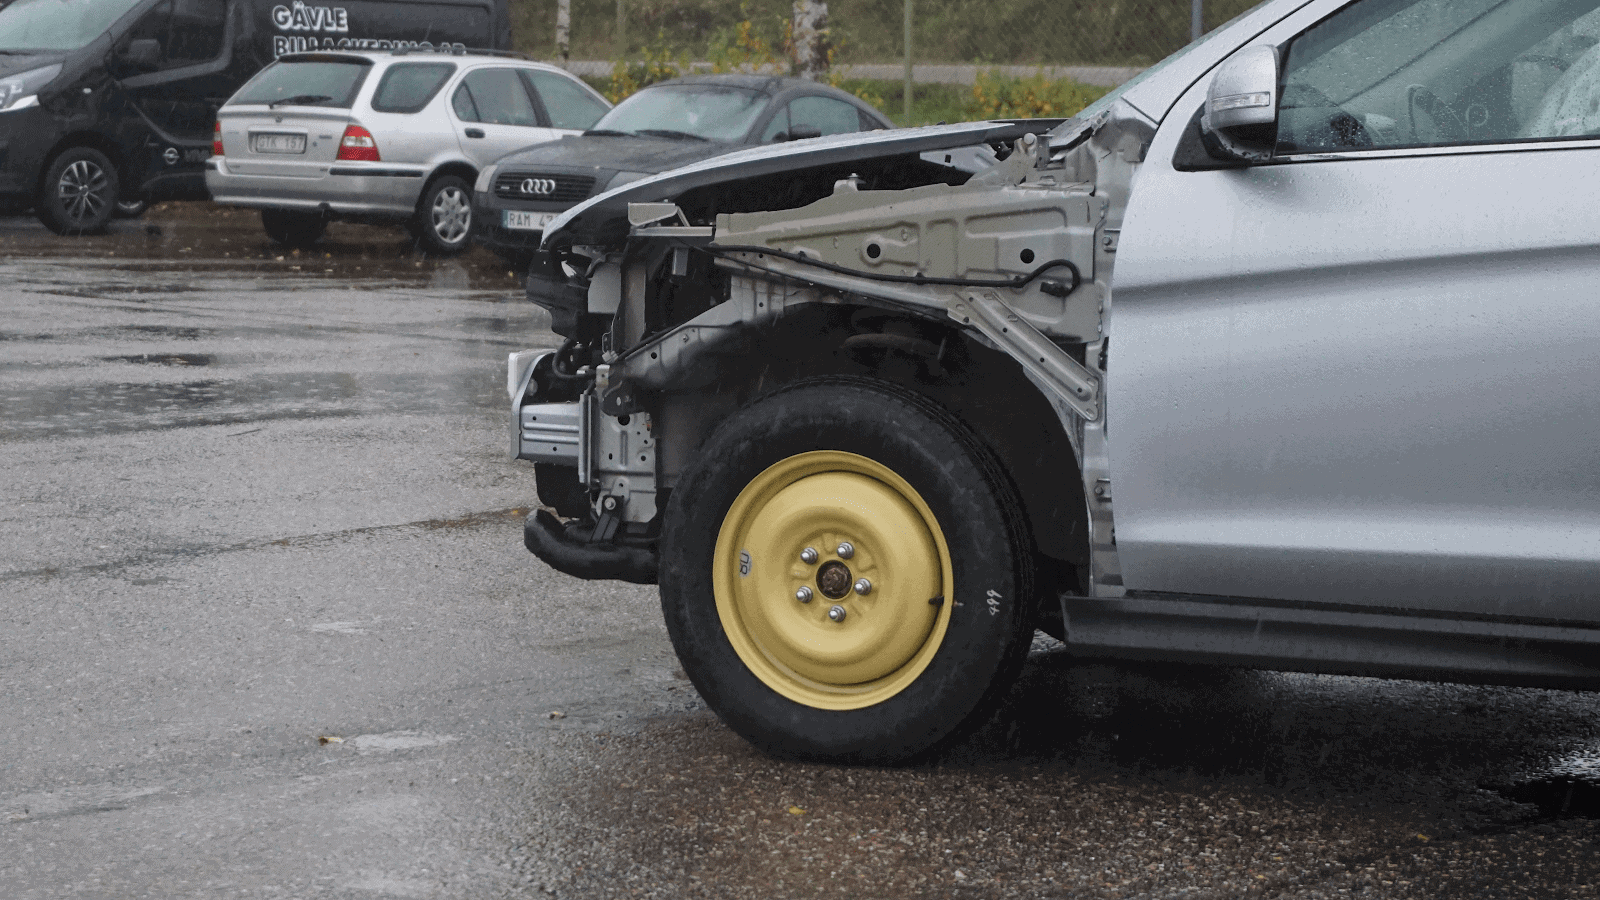 A car with a spare tire